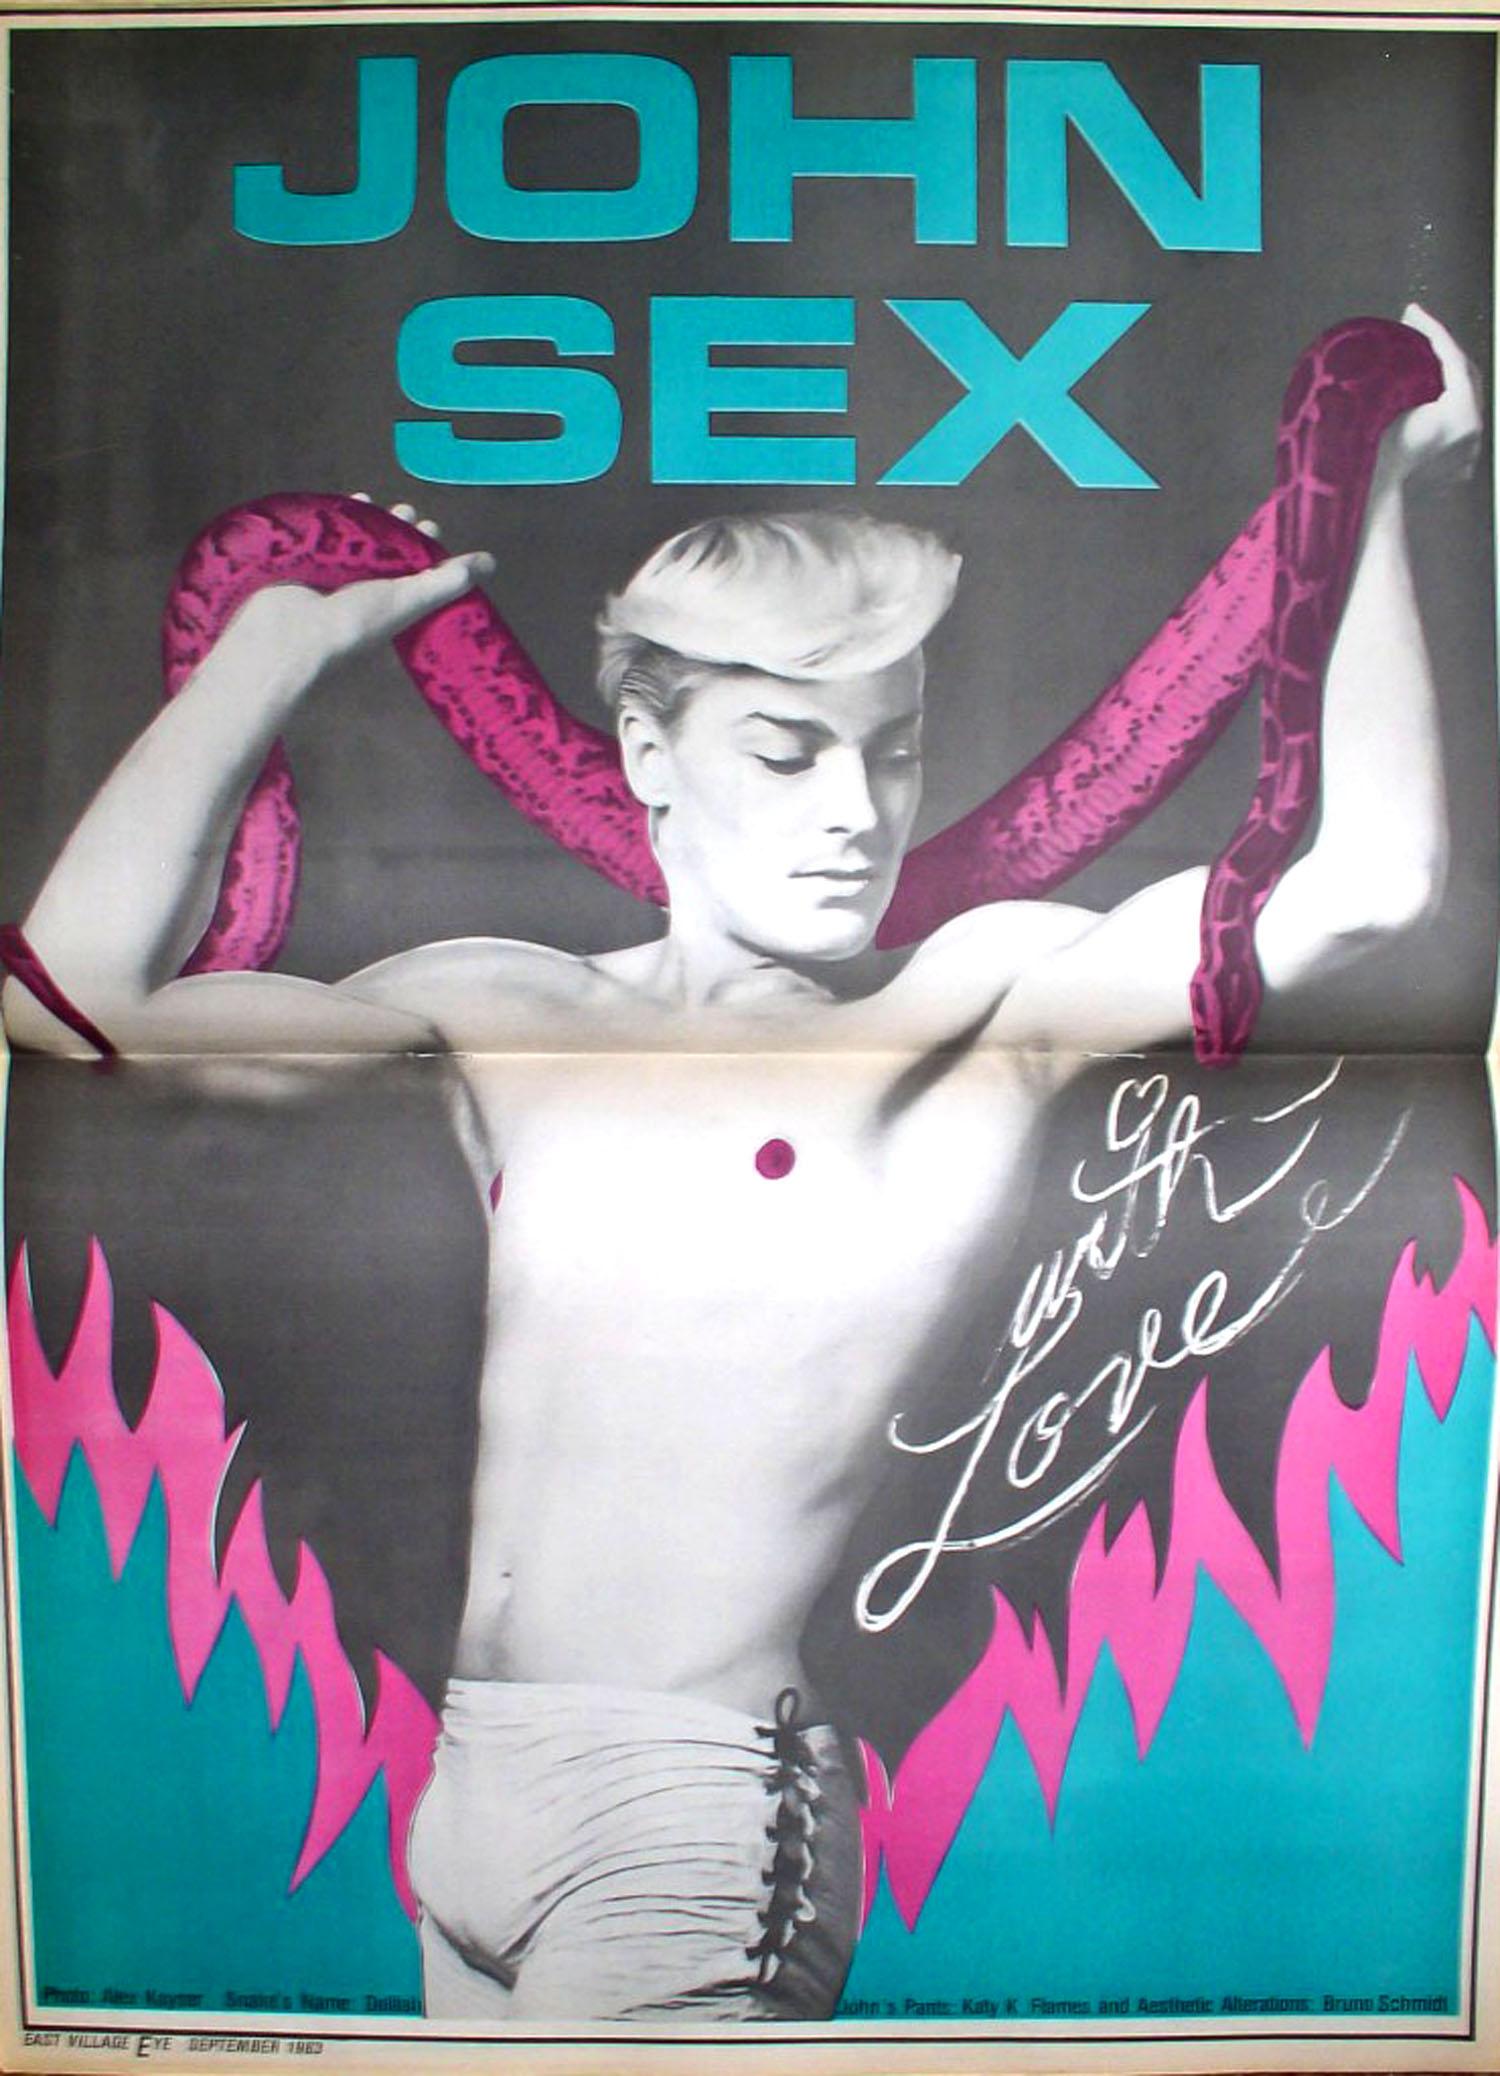 East Village Eye, Leonard Abrams, John Sex Centerfold, Vol. 5 No. 36